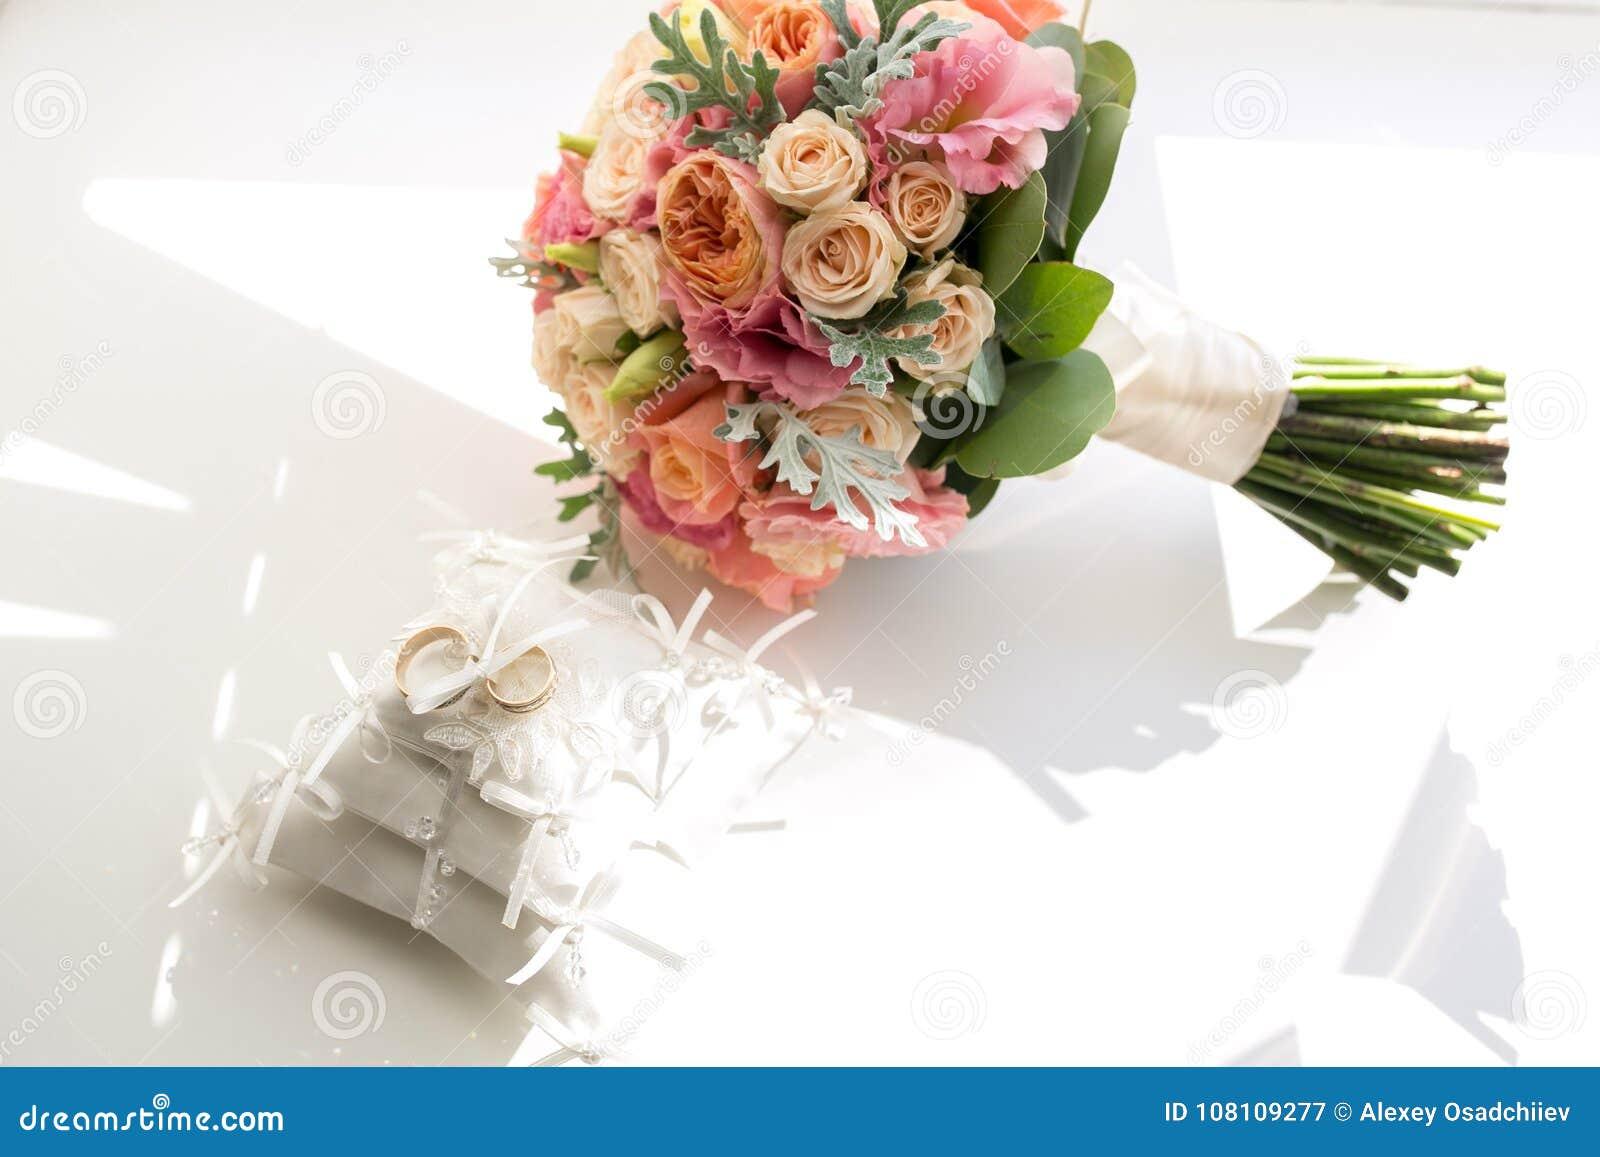 Big flower bouquet stock image. Image of engagement - 108109277